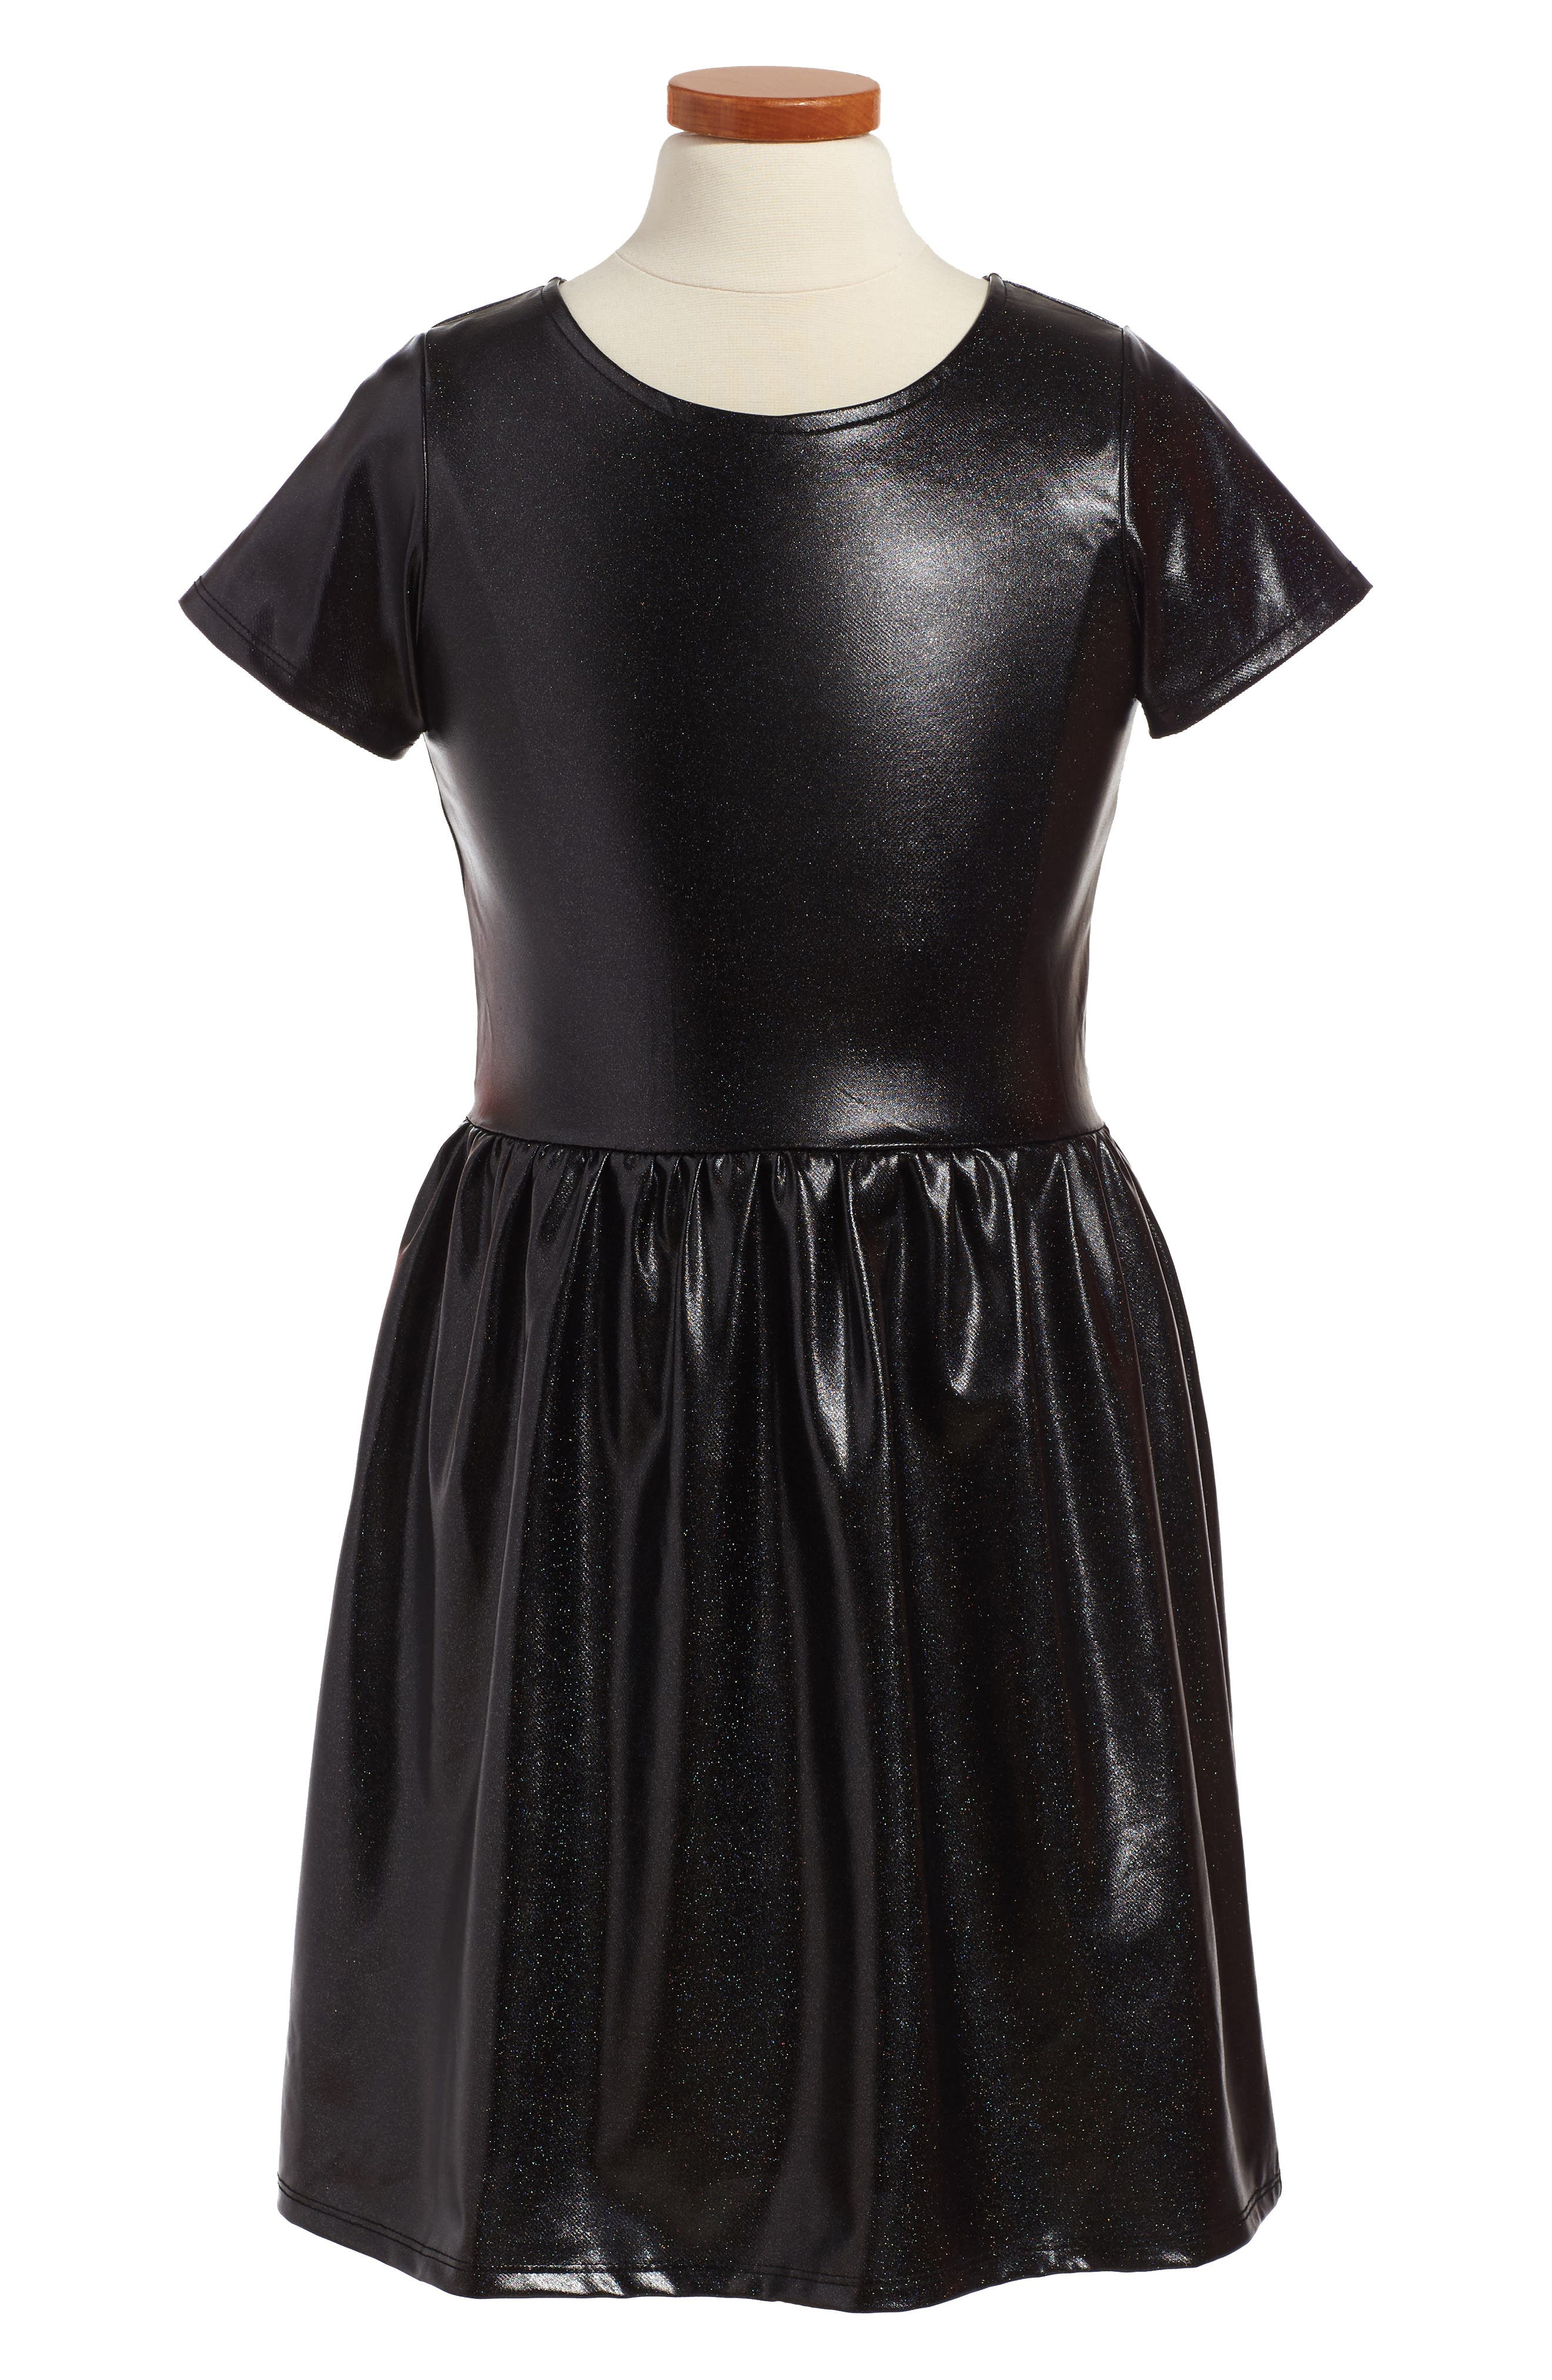 Alternate Image 1 Selected - Appaman Kelsey Dress (Toddler Girls, Little Girls & Big Girls)